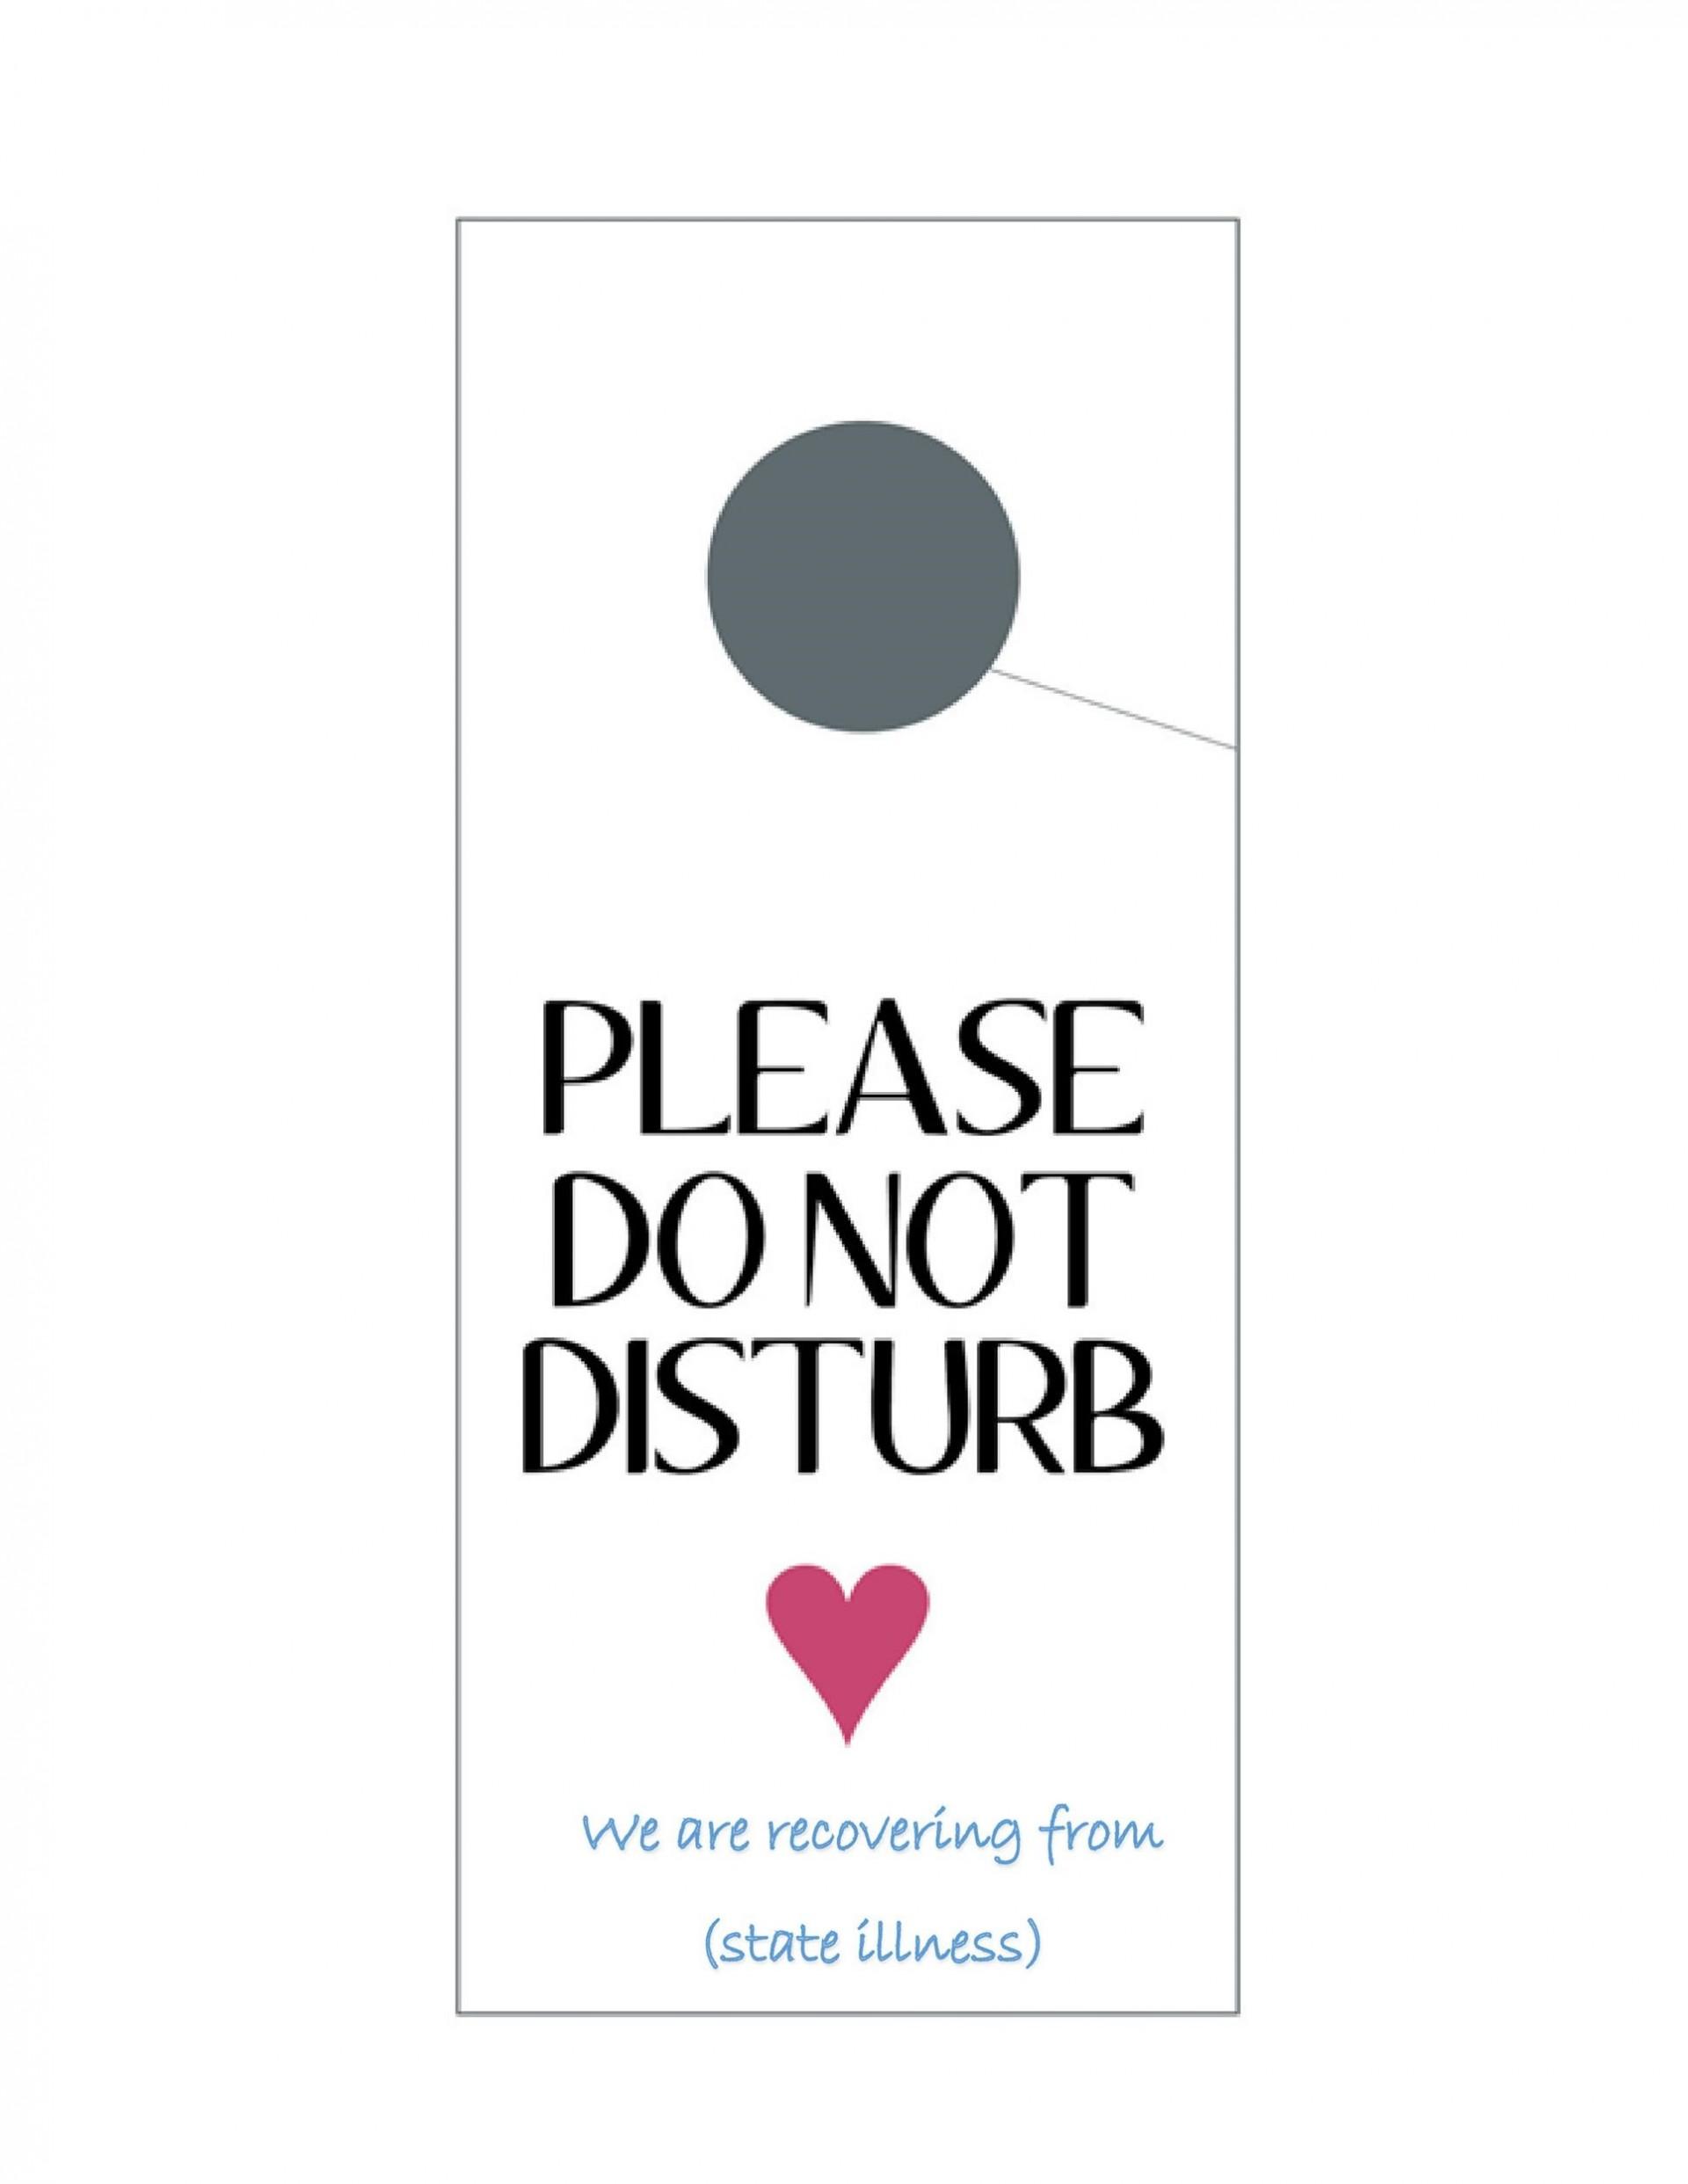 005 Wonderful Door Hanger Template For Word Inspiration  Free Microsoft1920